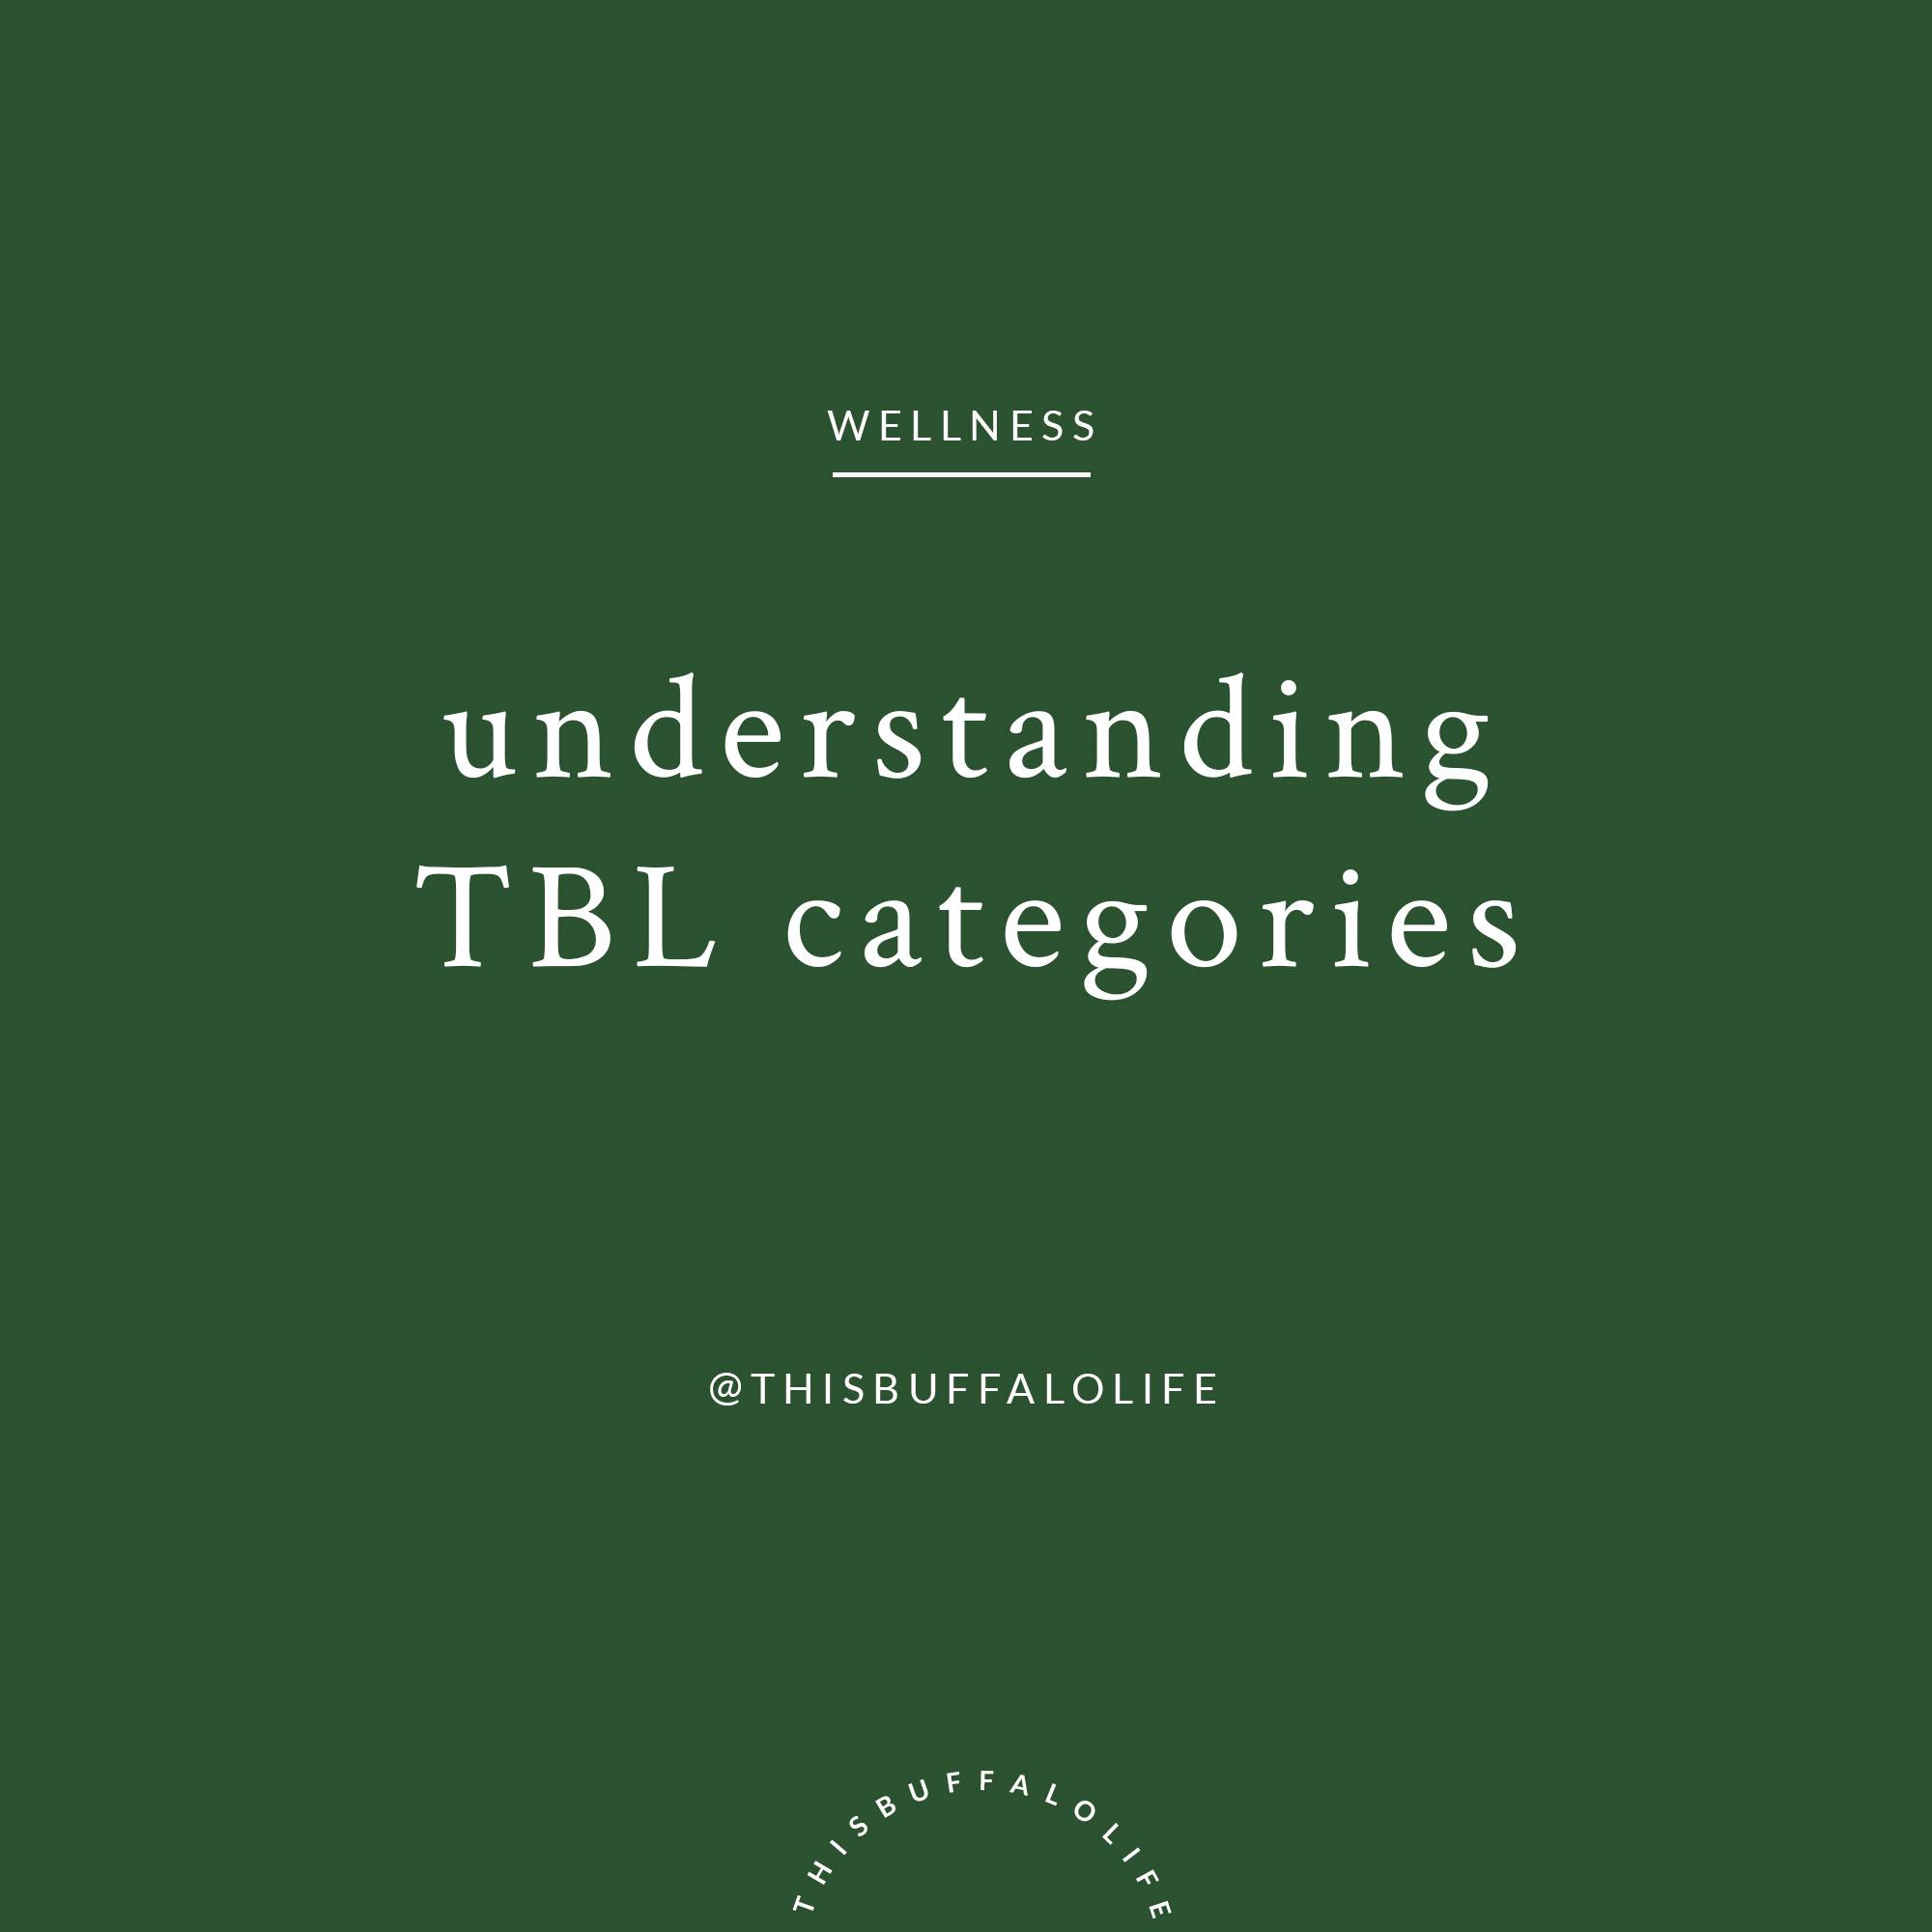 TBLcategories.jpg